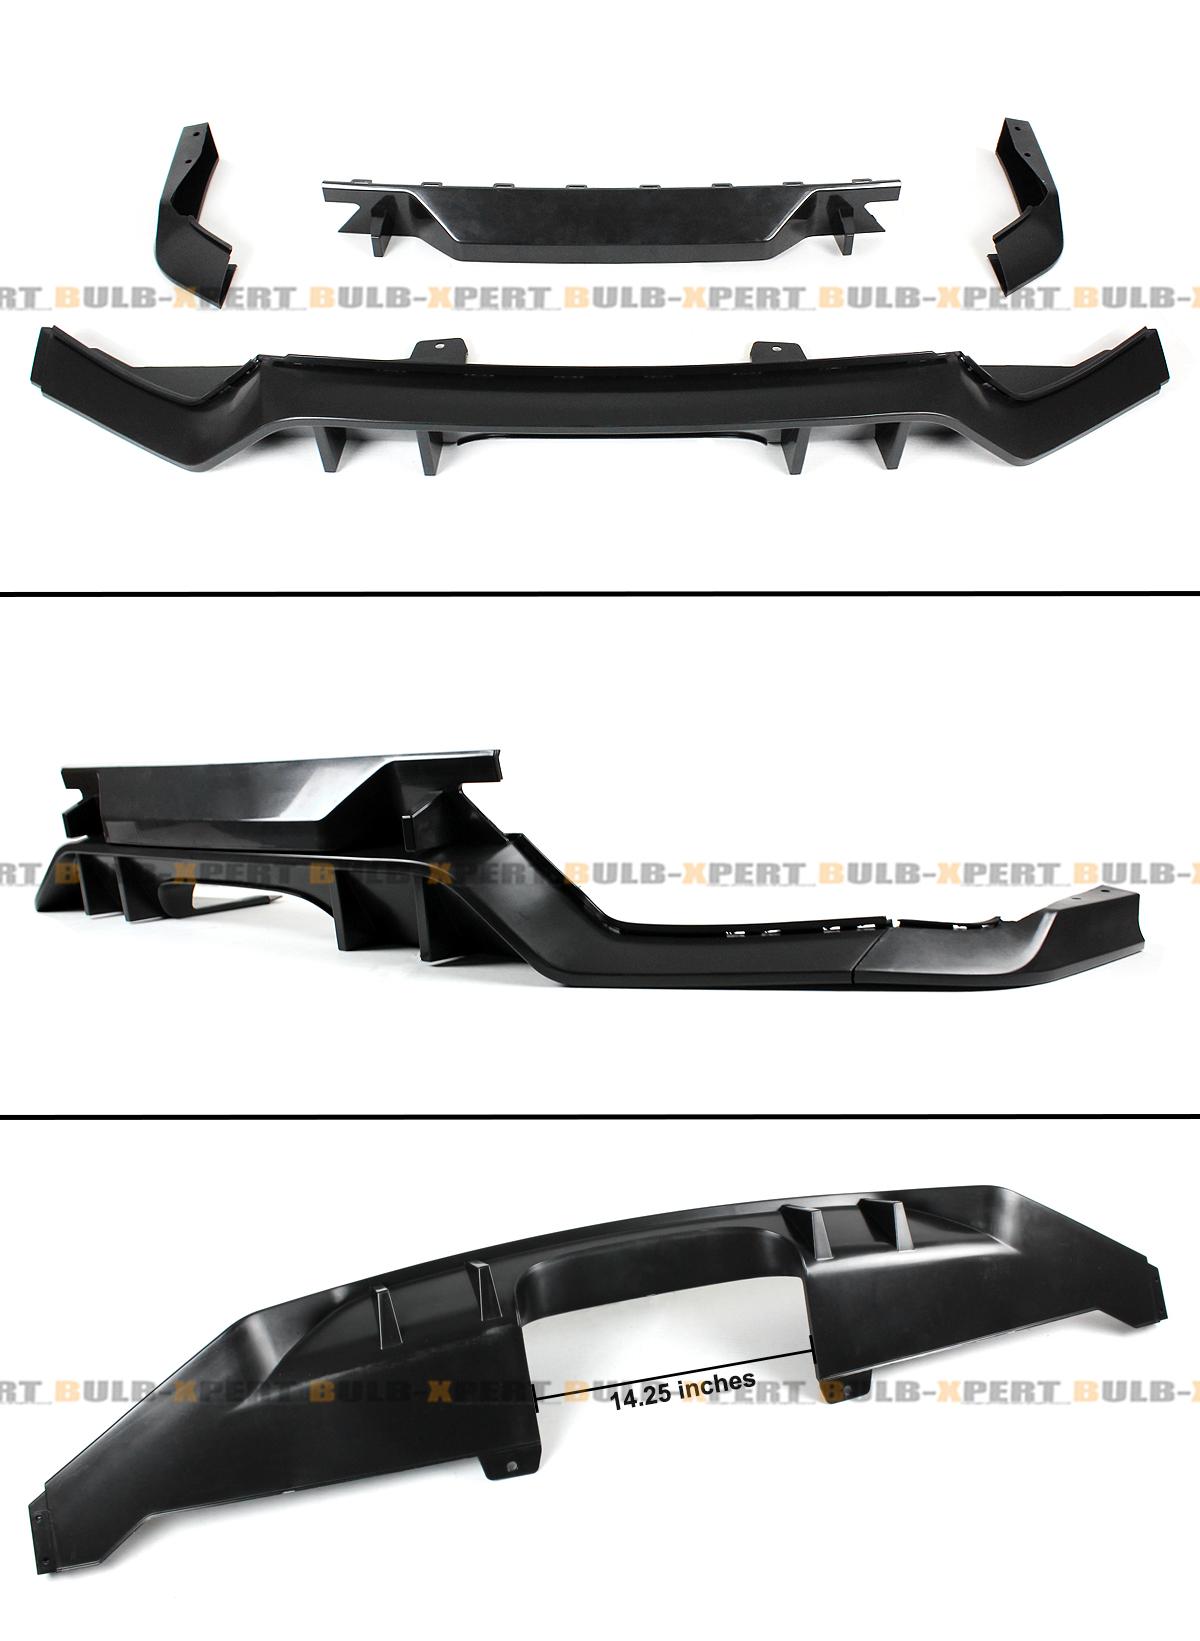 FOR 2016-2018 HONDA CIVIC FK7 HATCHBACK SPORT TYPE-R STYLE REAR BUMPER DIFFUSER | eBay